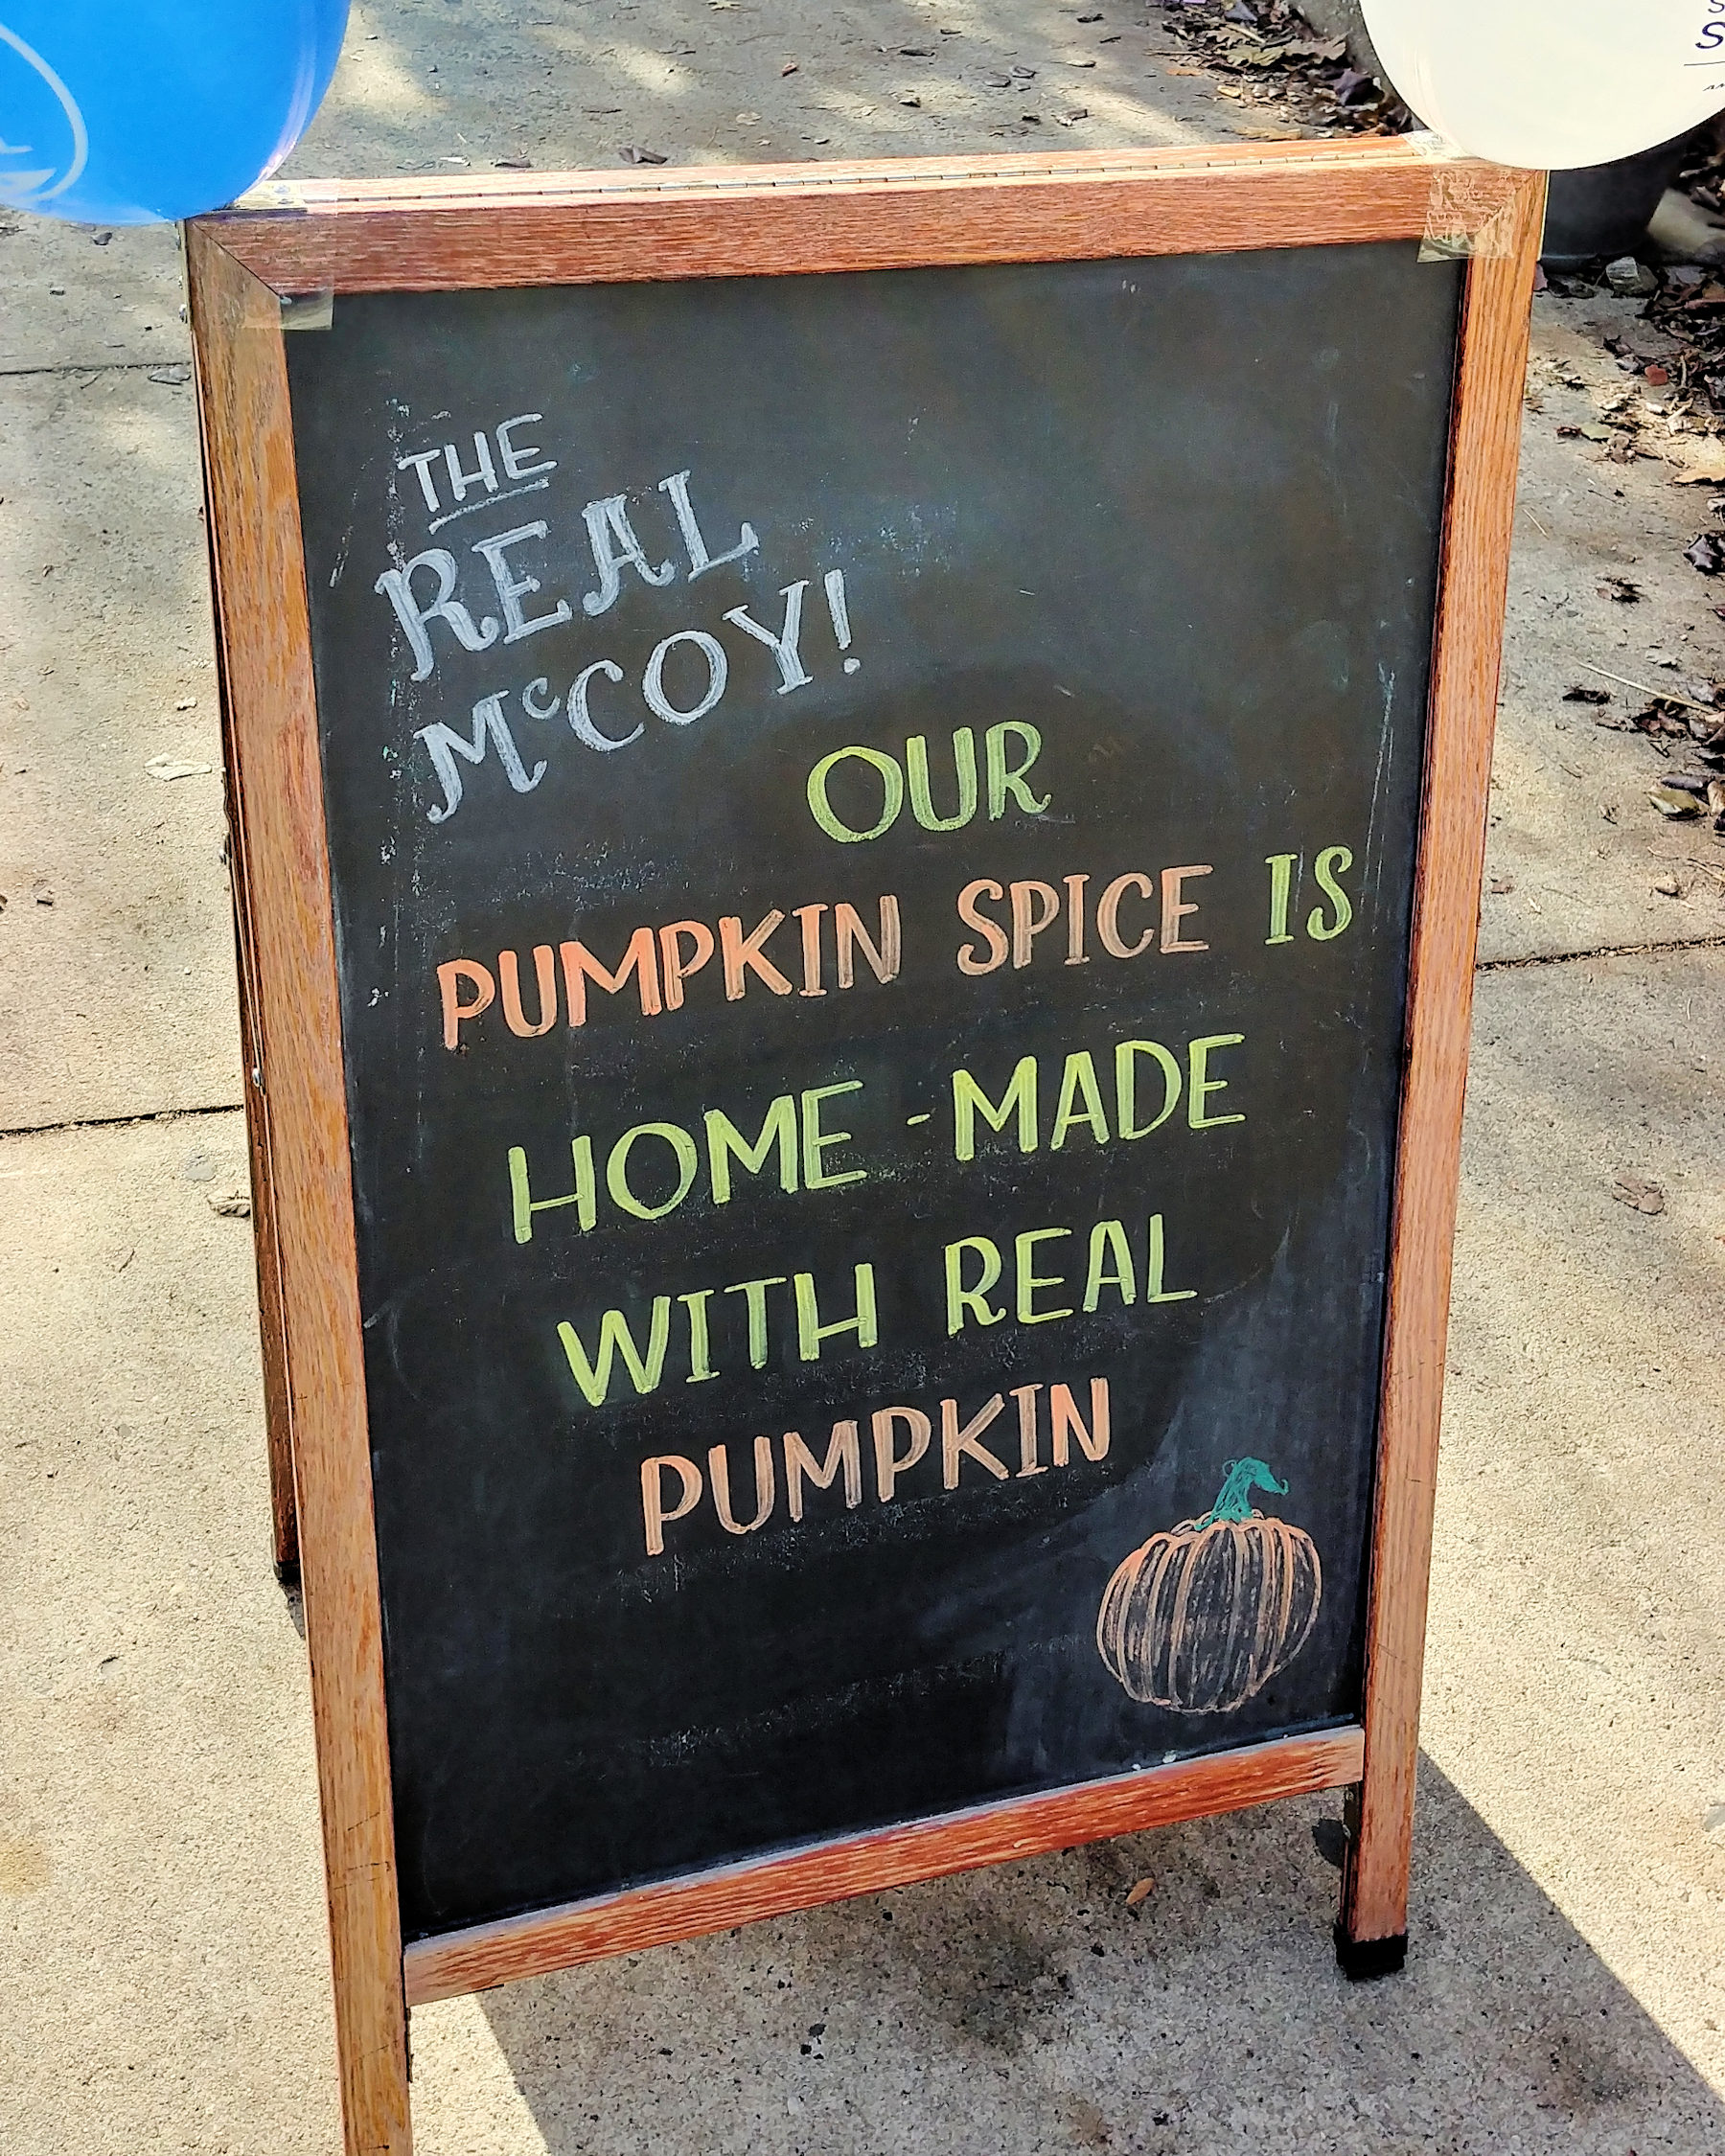 Velvet Sky Cafe - Real Pumpkin Latte